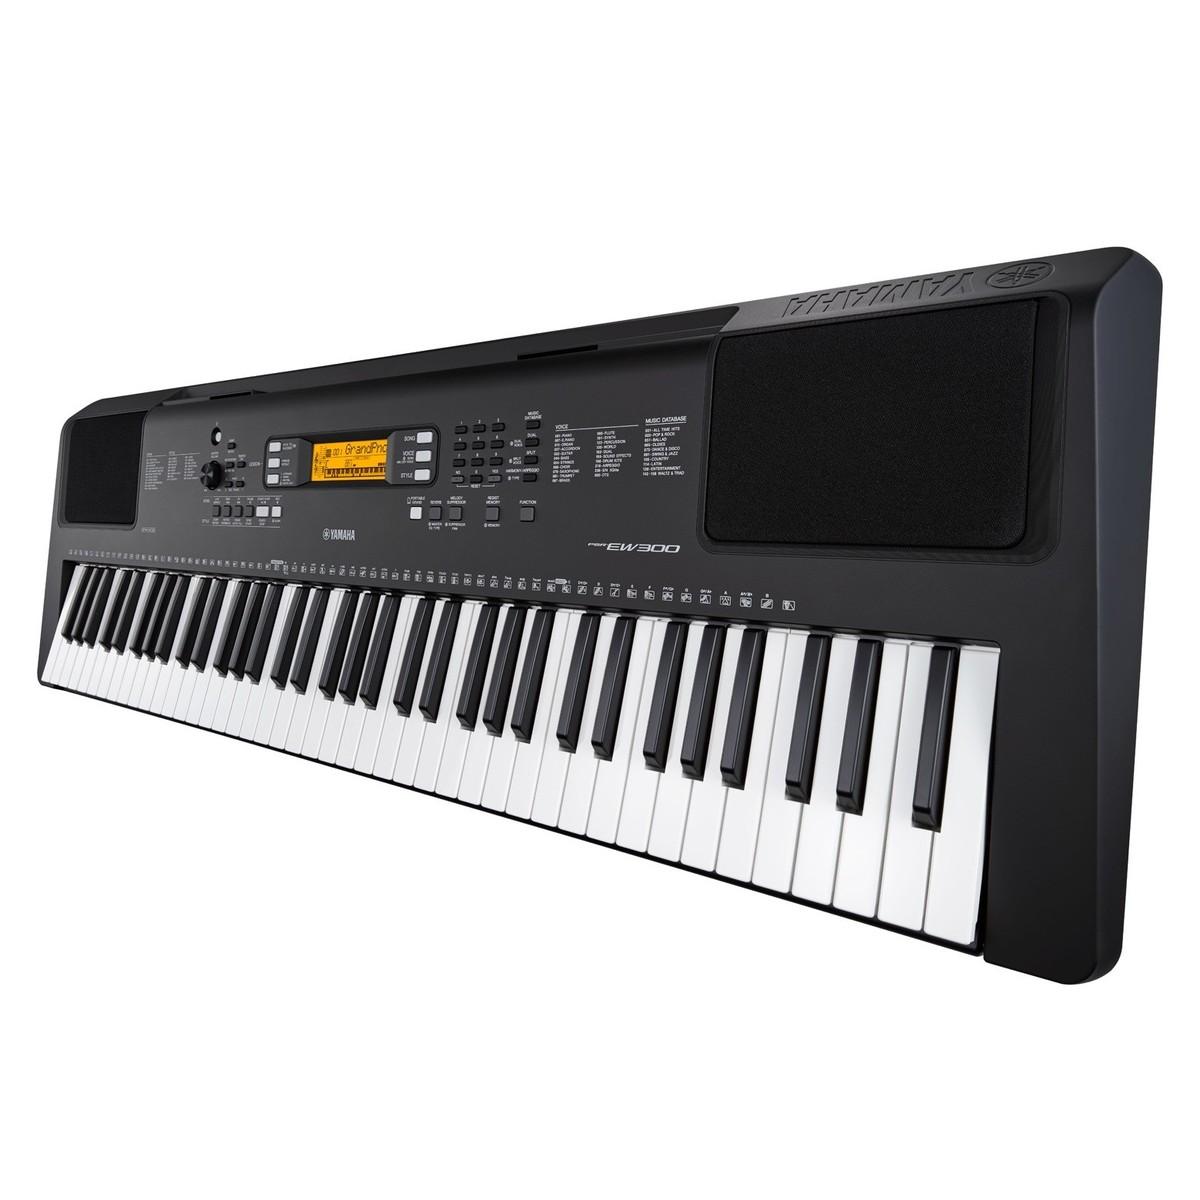 yamaha psr ew300 portable keyboard at gear4music. Black Bedroom Furniture Sets. Home Design Ideas